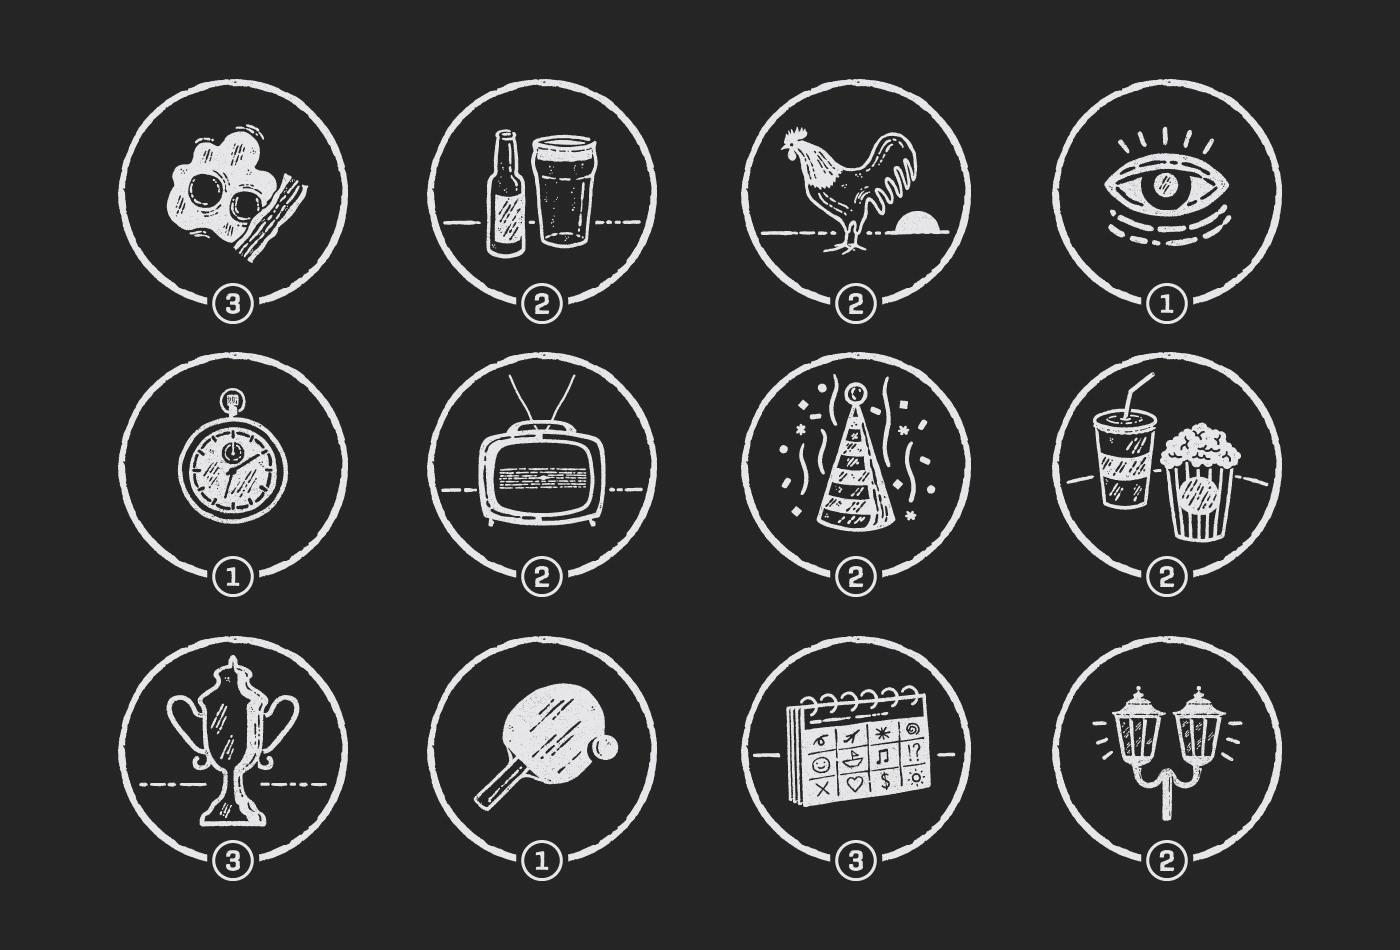 B-logo-collection-vacaliebres-copia